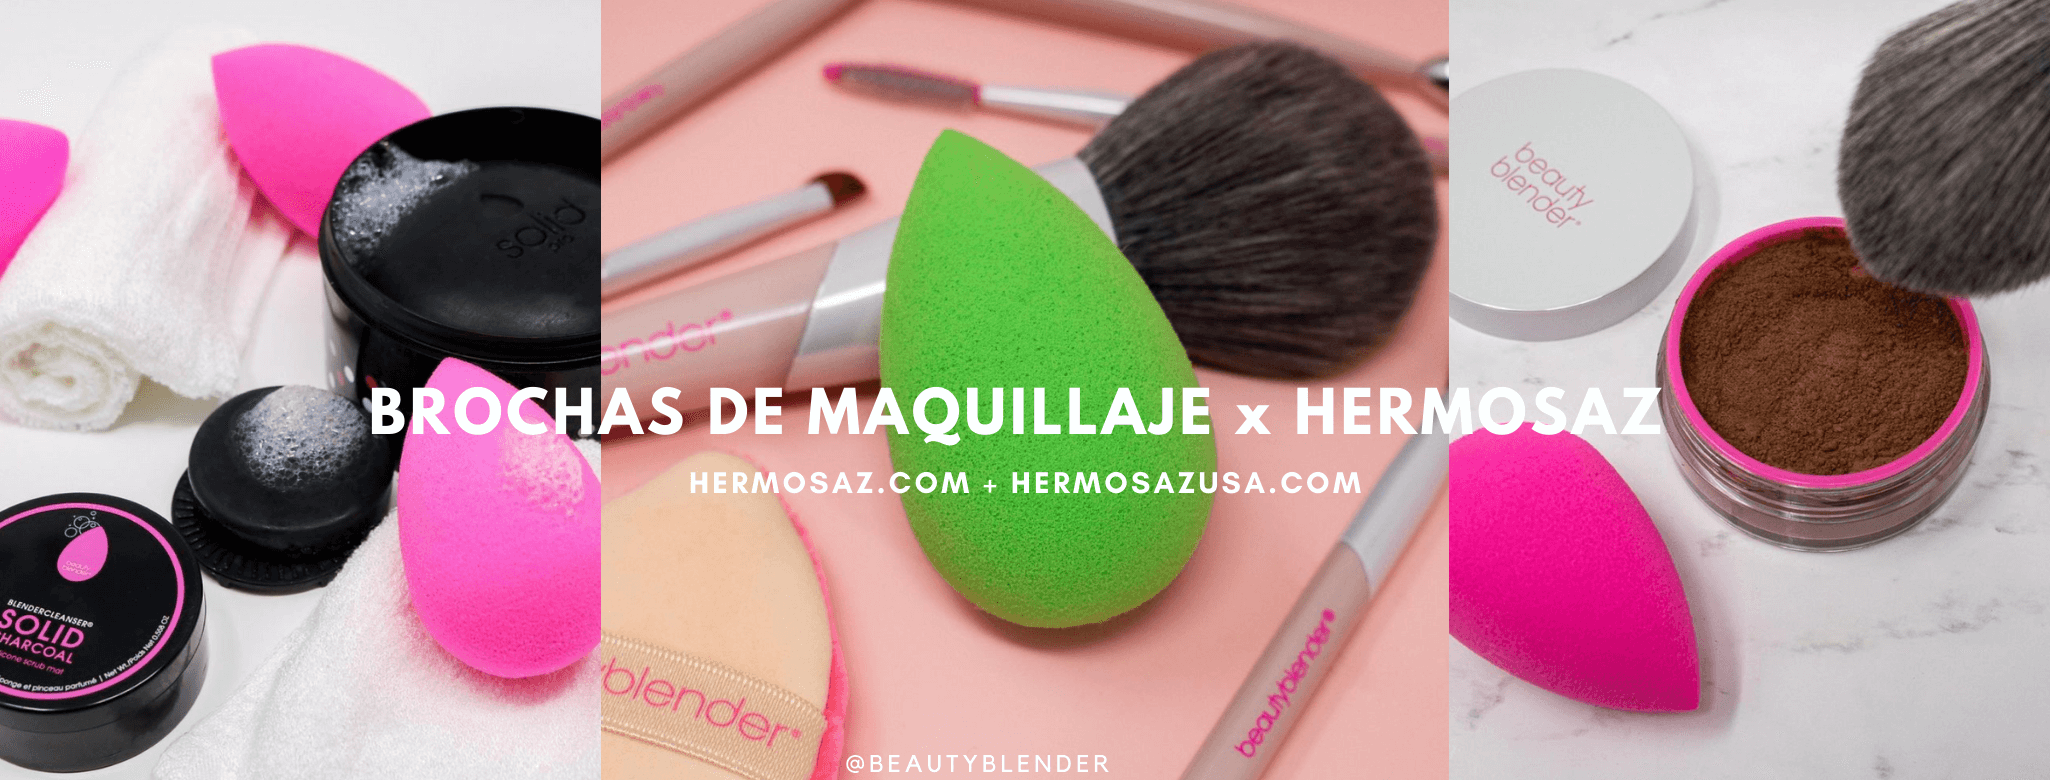 Makeup brush and tools x Hermosaz